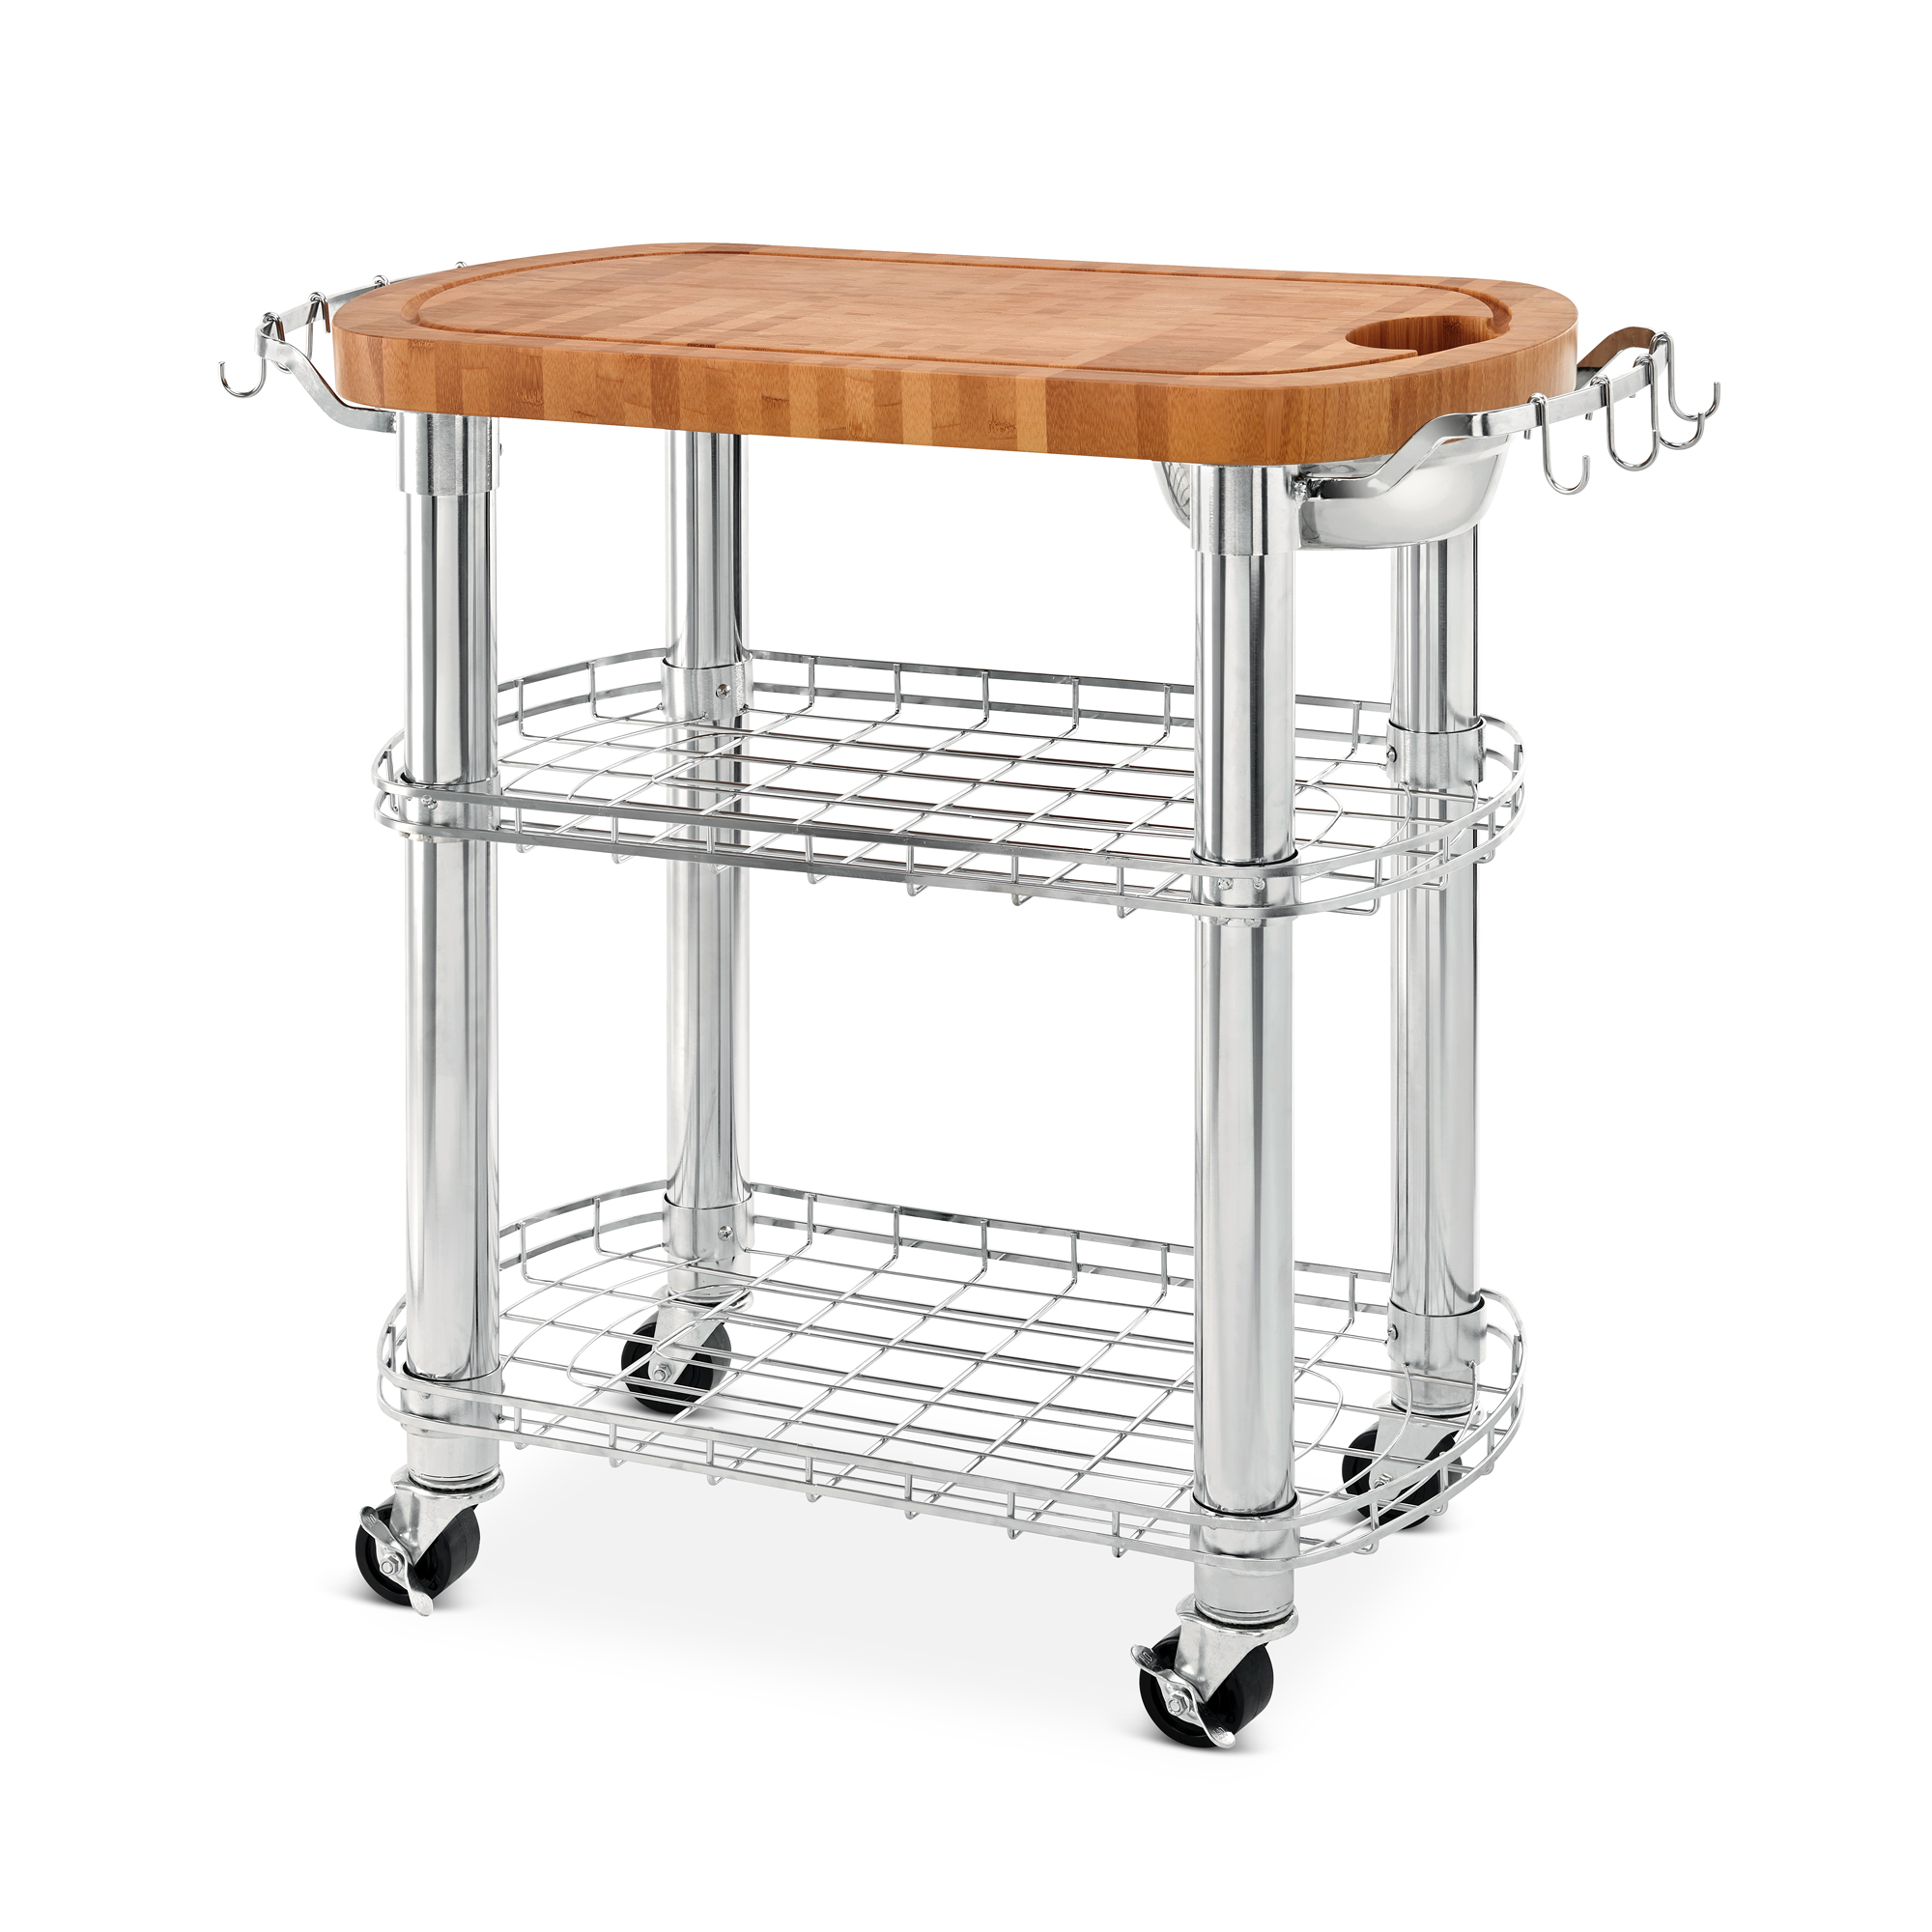 seville classics rolling oval solid bamboo butcher block top kitchen island cart with storage 39 w x 20 d x 36 h walmart com walmart com